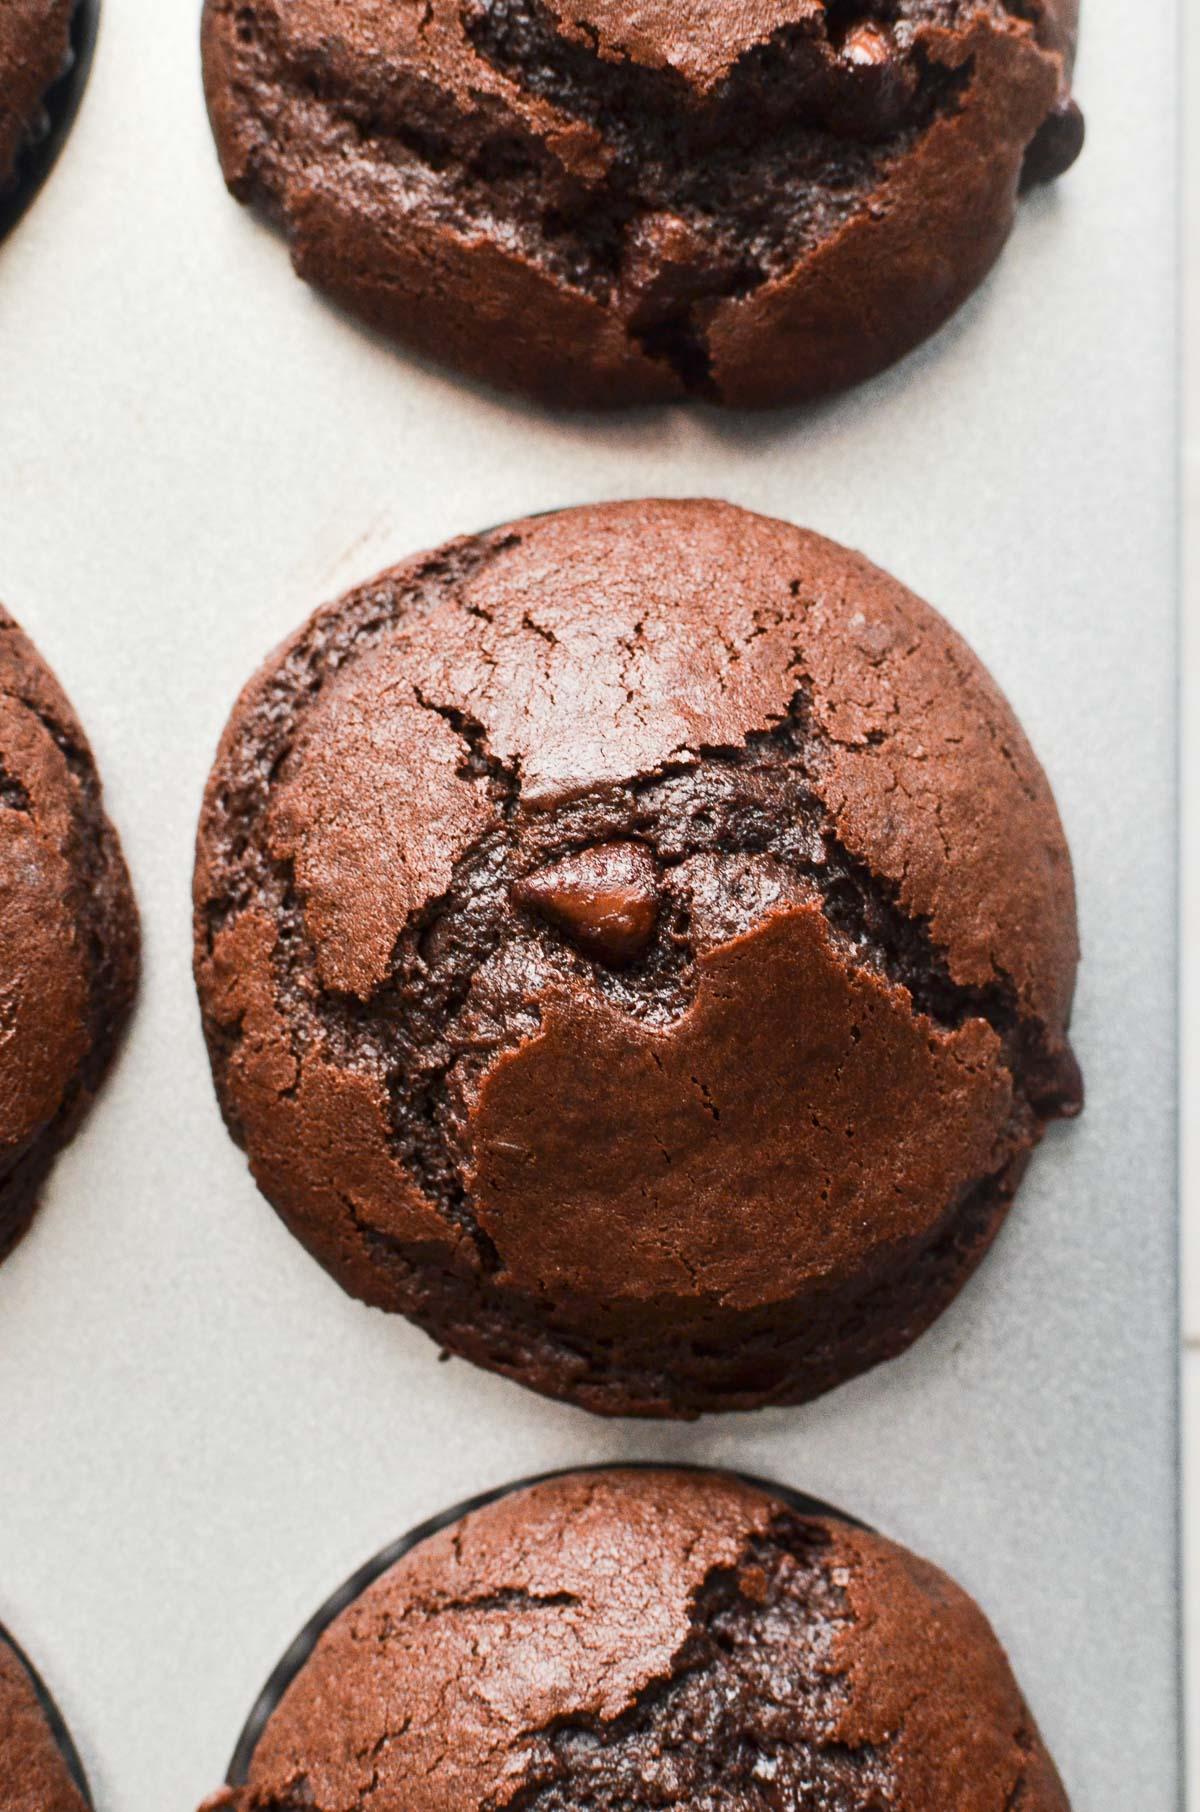 A close up of a chocolate muffin